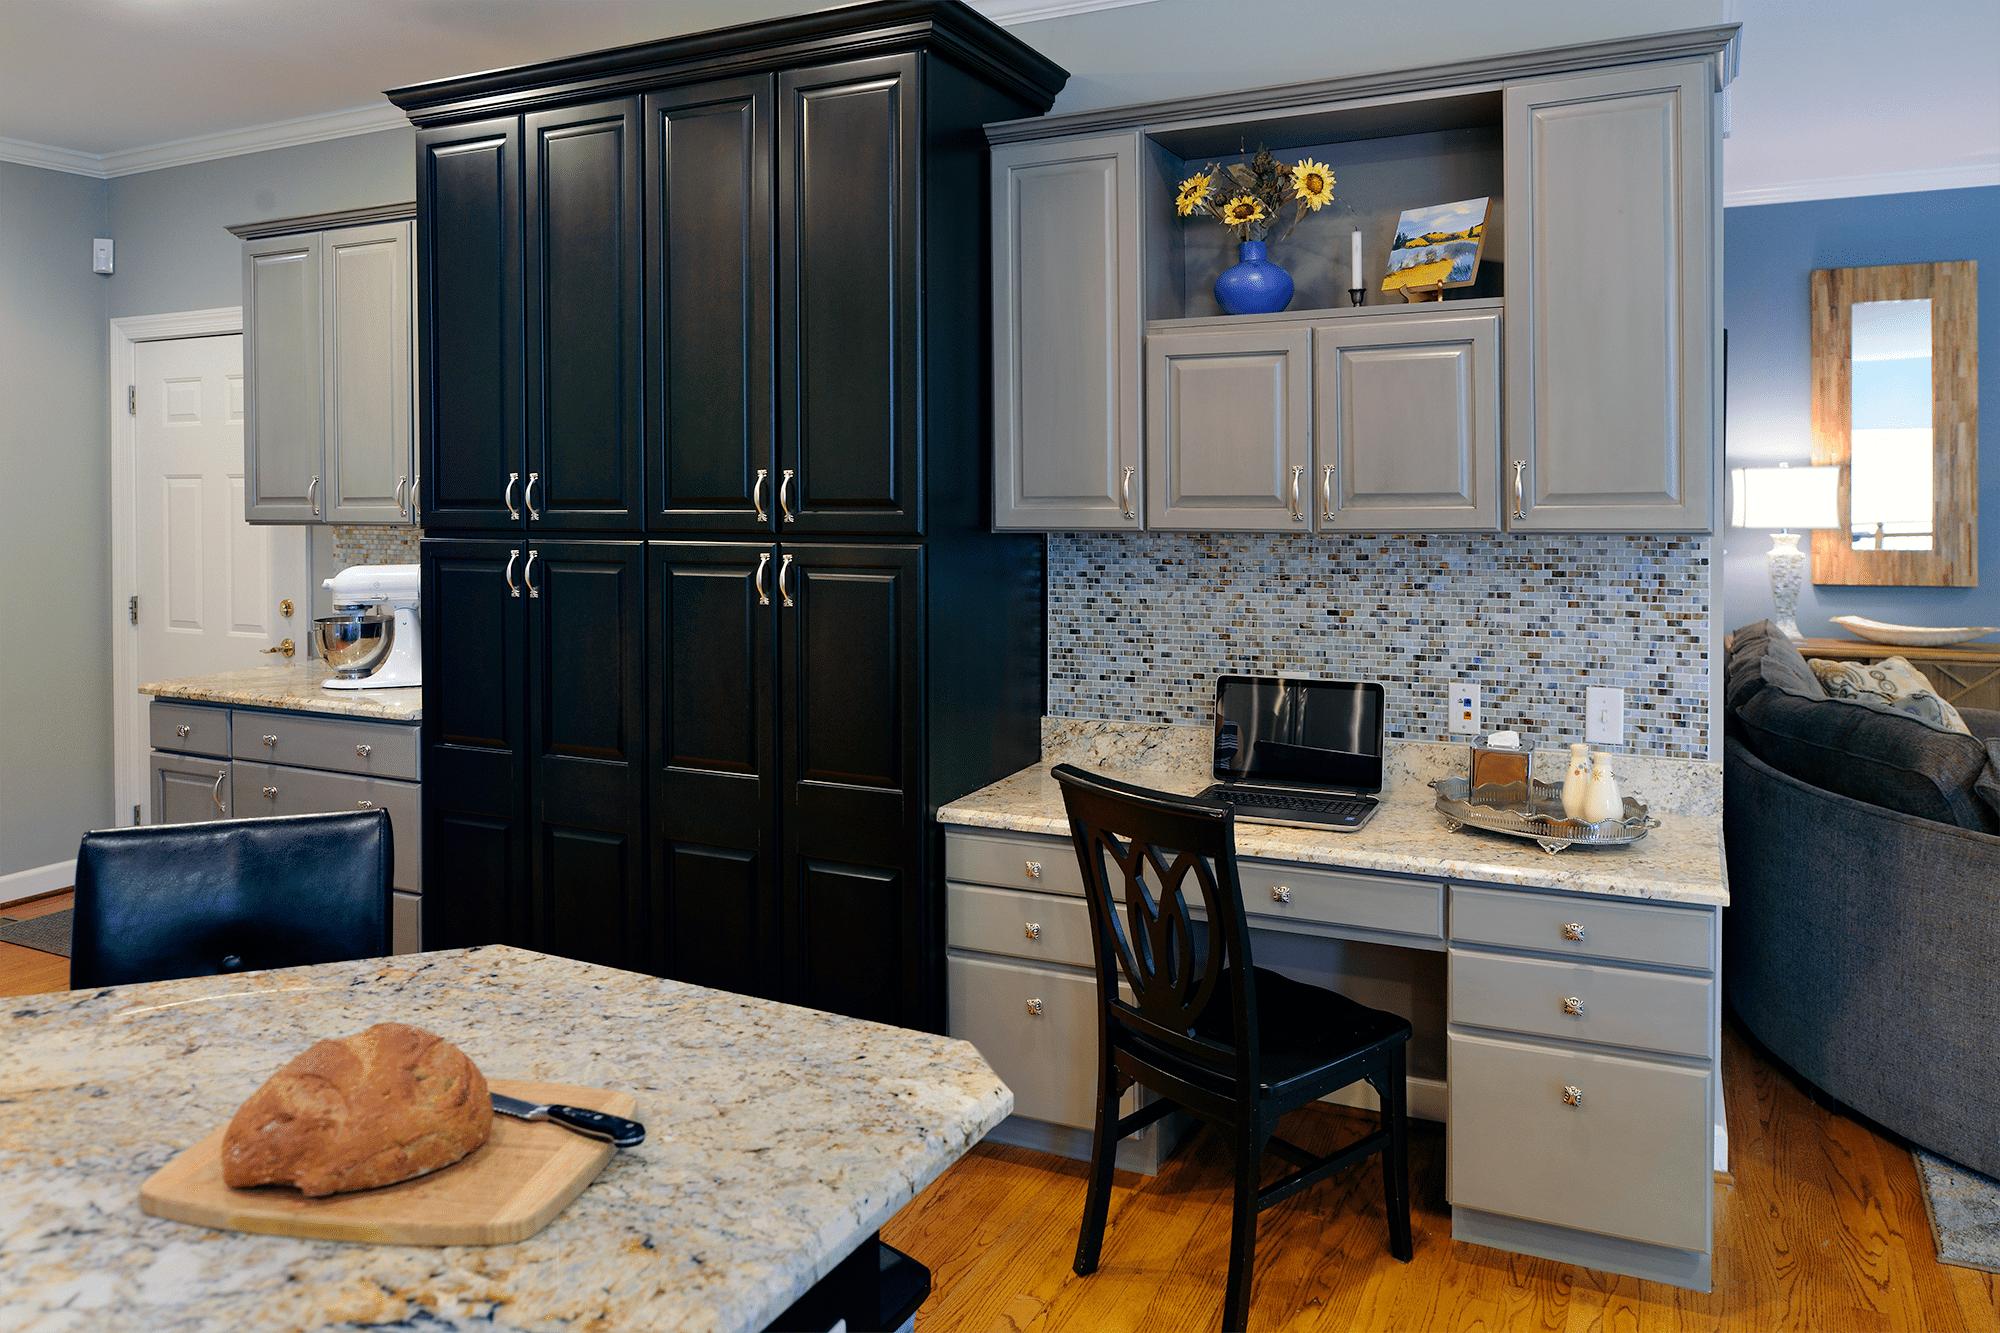 Bread on chopping board near cabinet